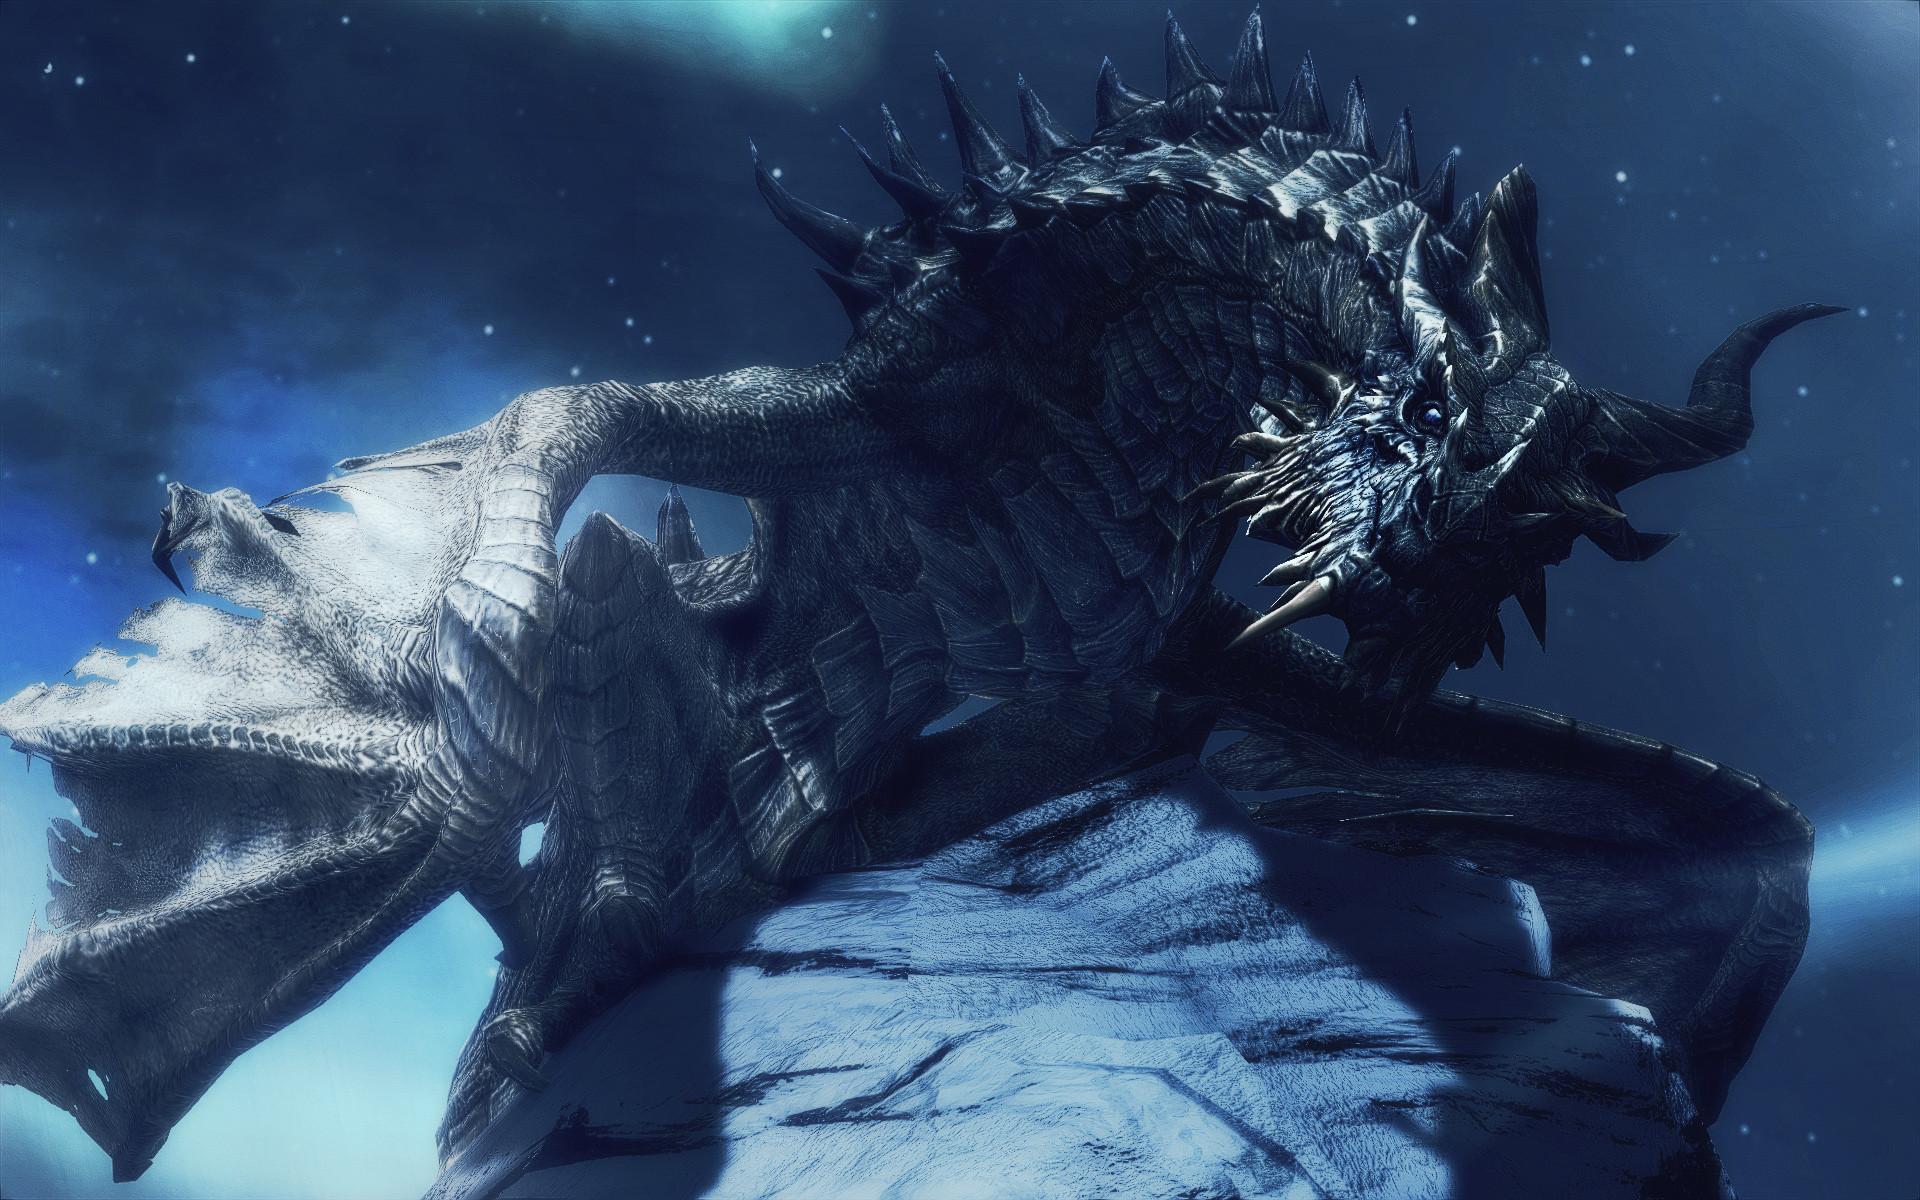 Dragons Games Horns Parthanax The Elder Scrolls V Skyrim Wings